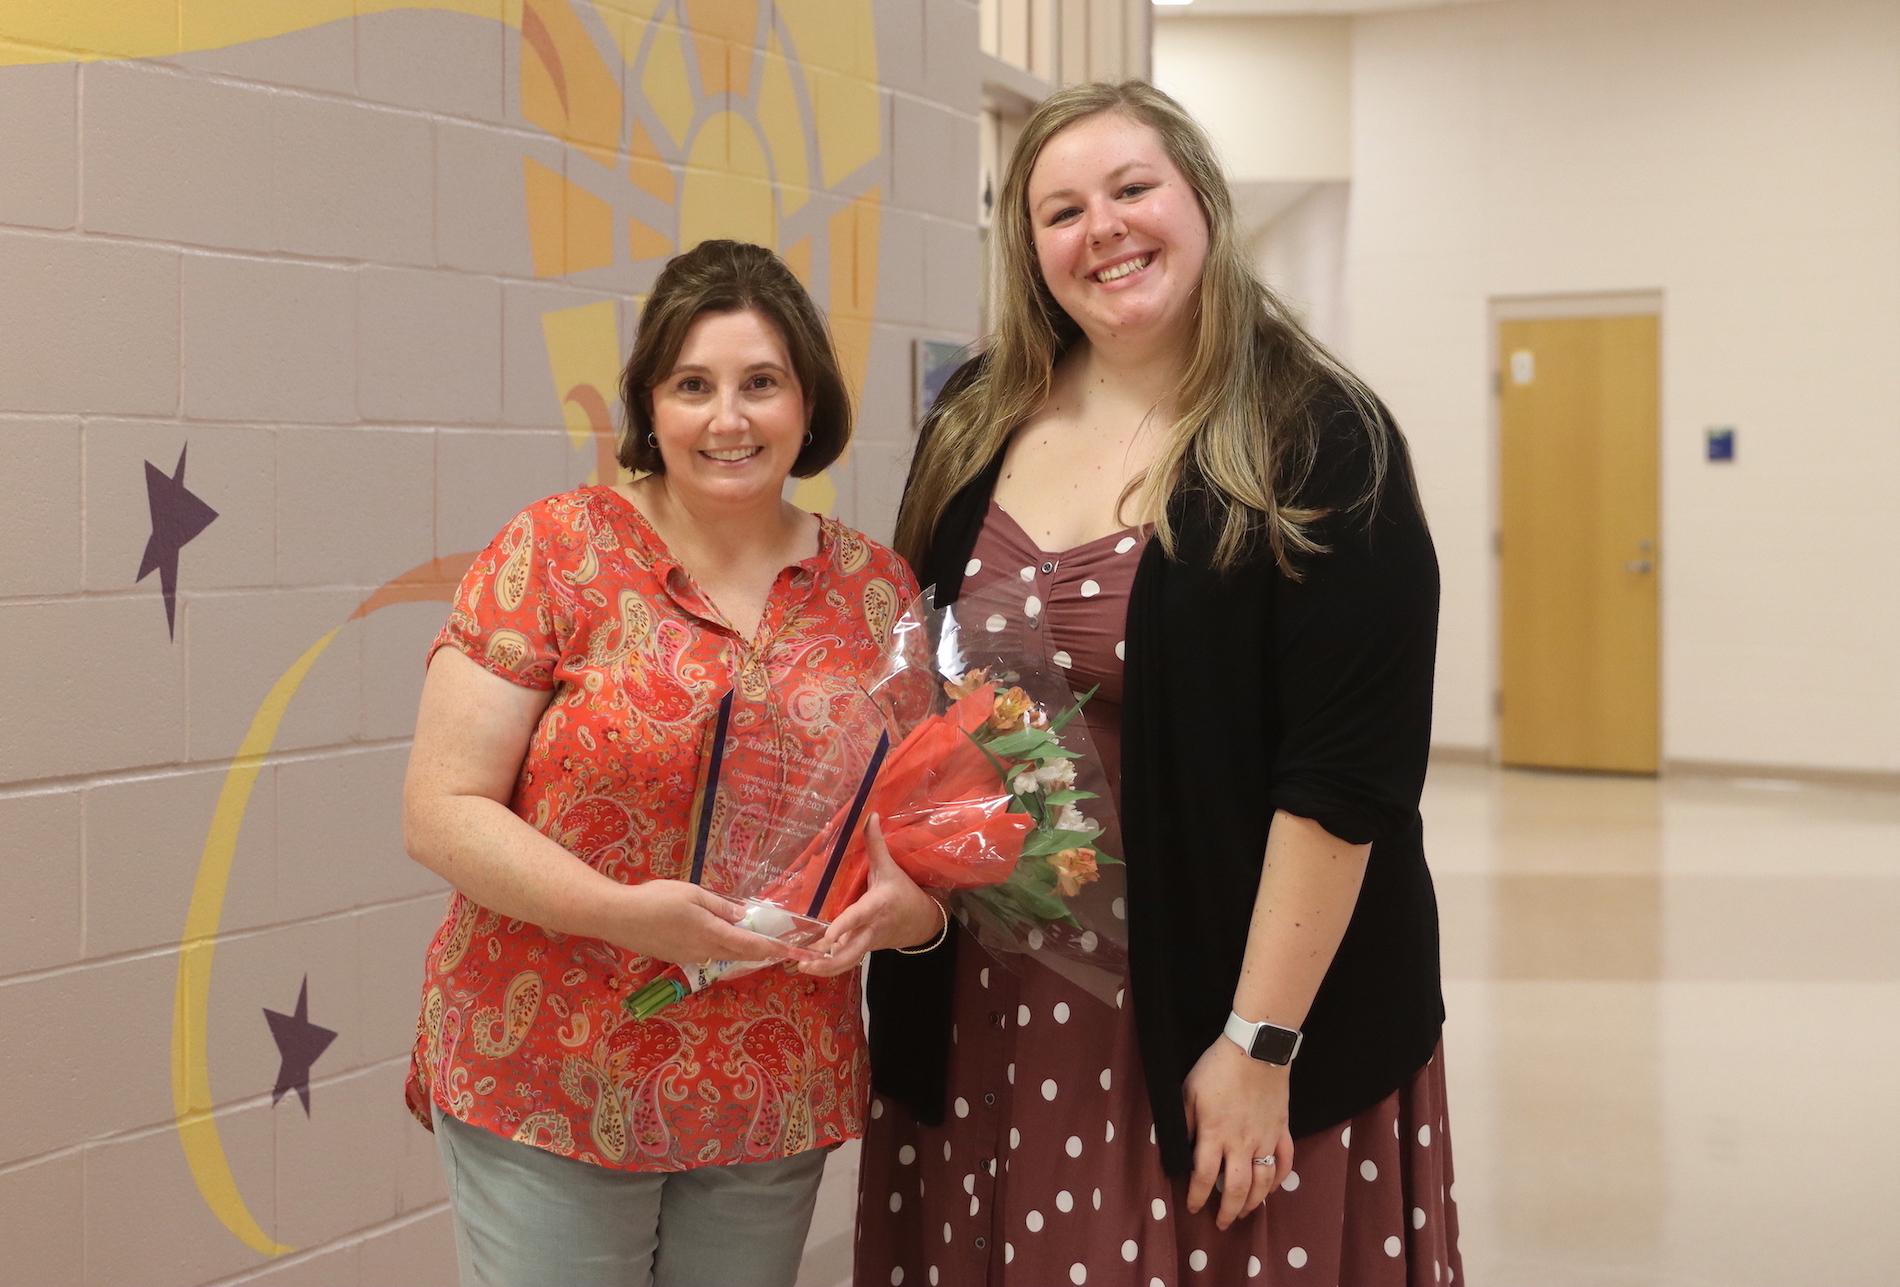 Danielle and Kimberly Holding Award